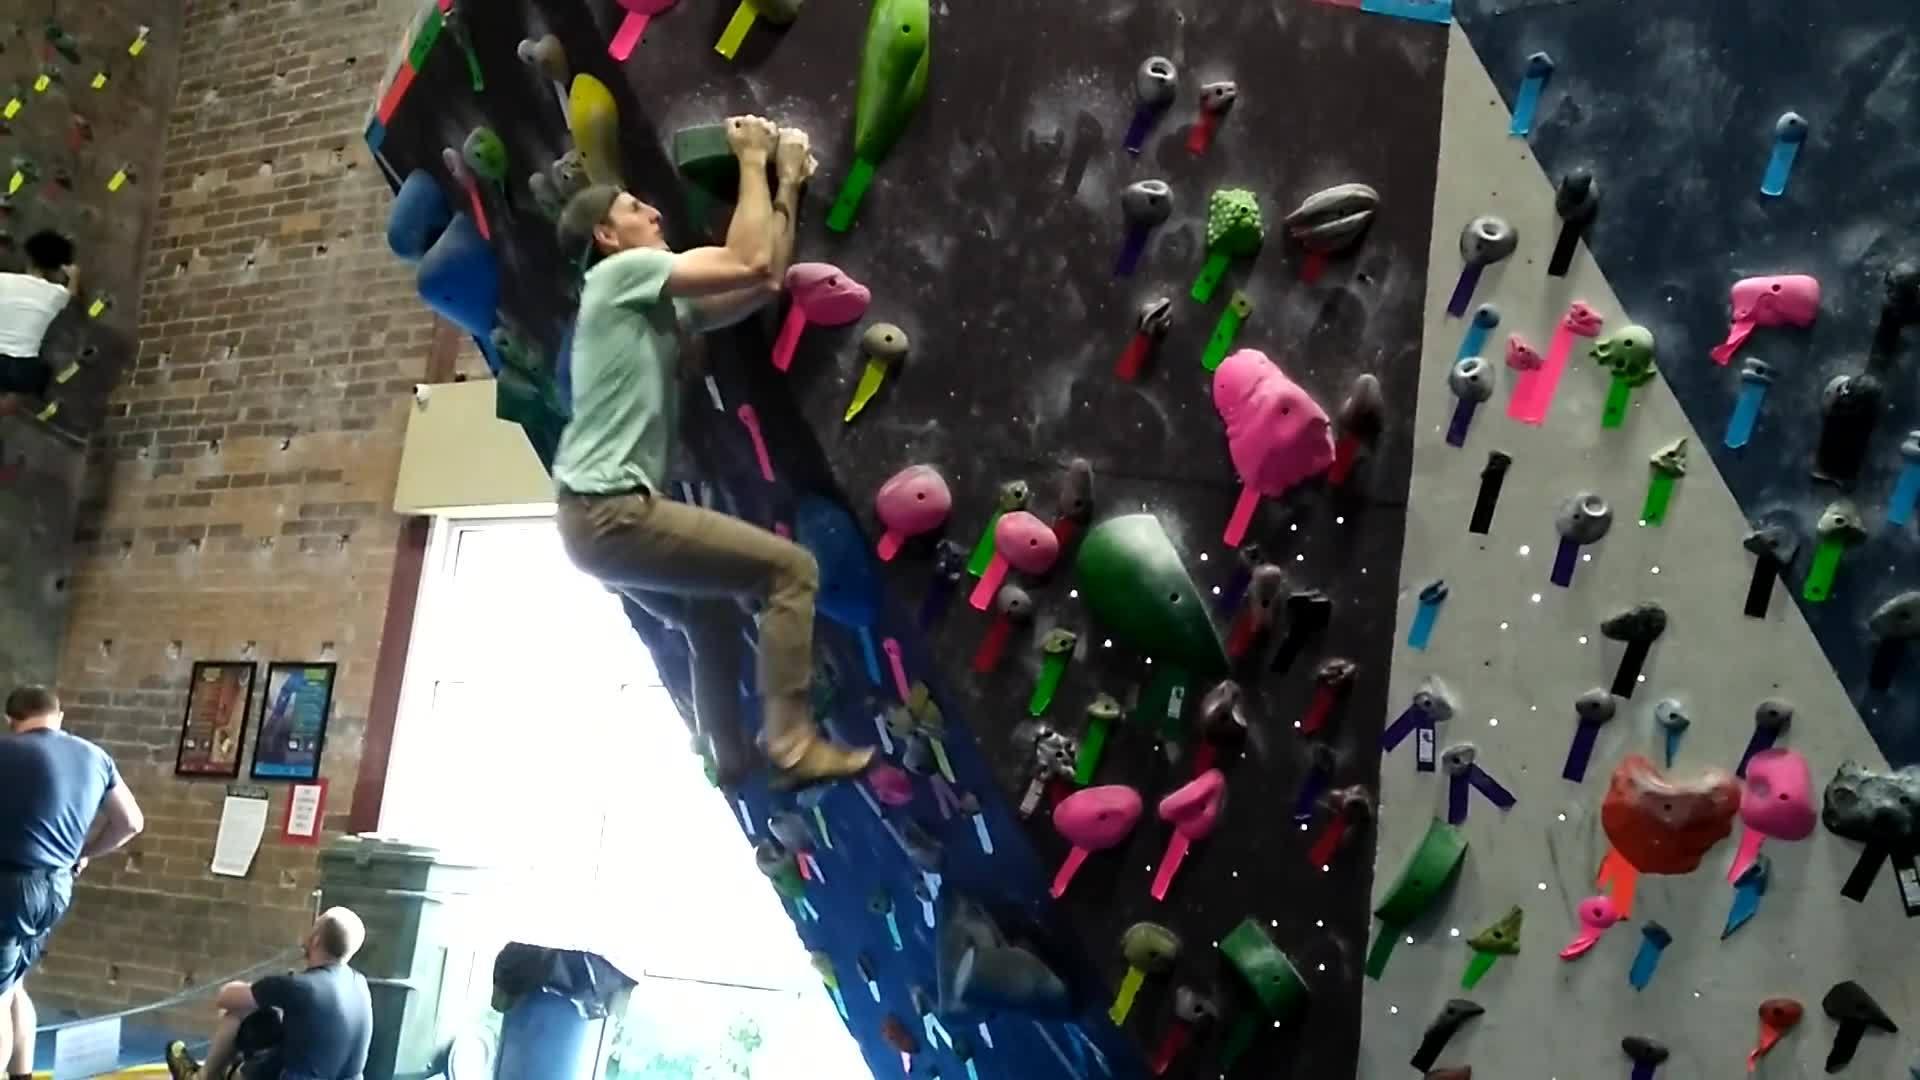 bouldering, 2 GIFs